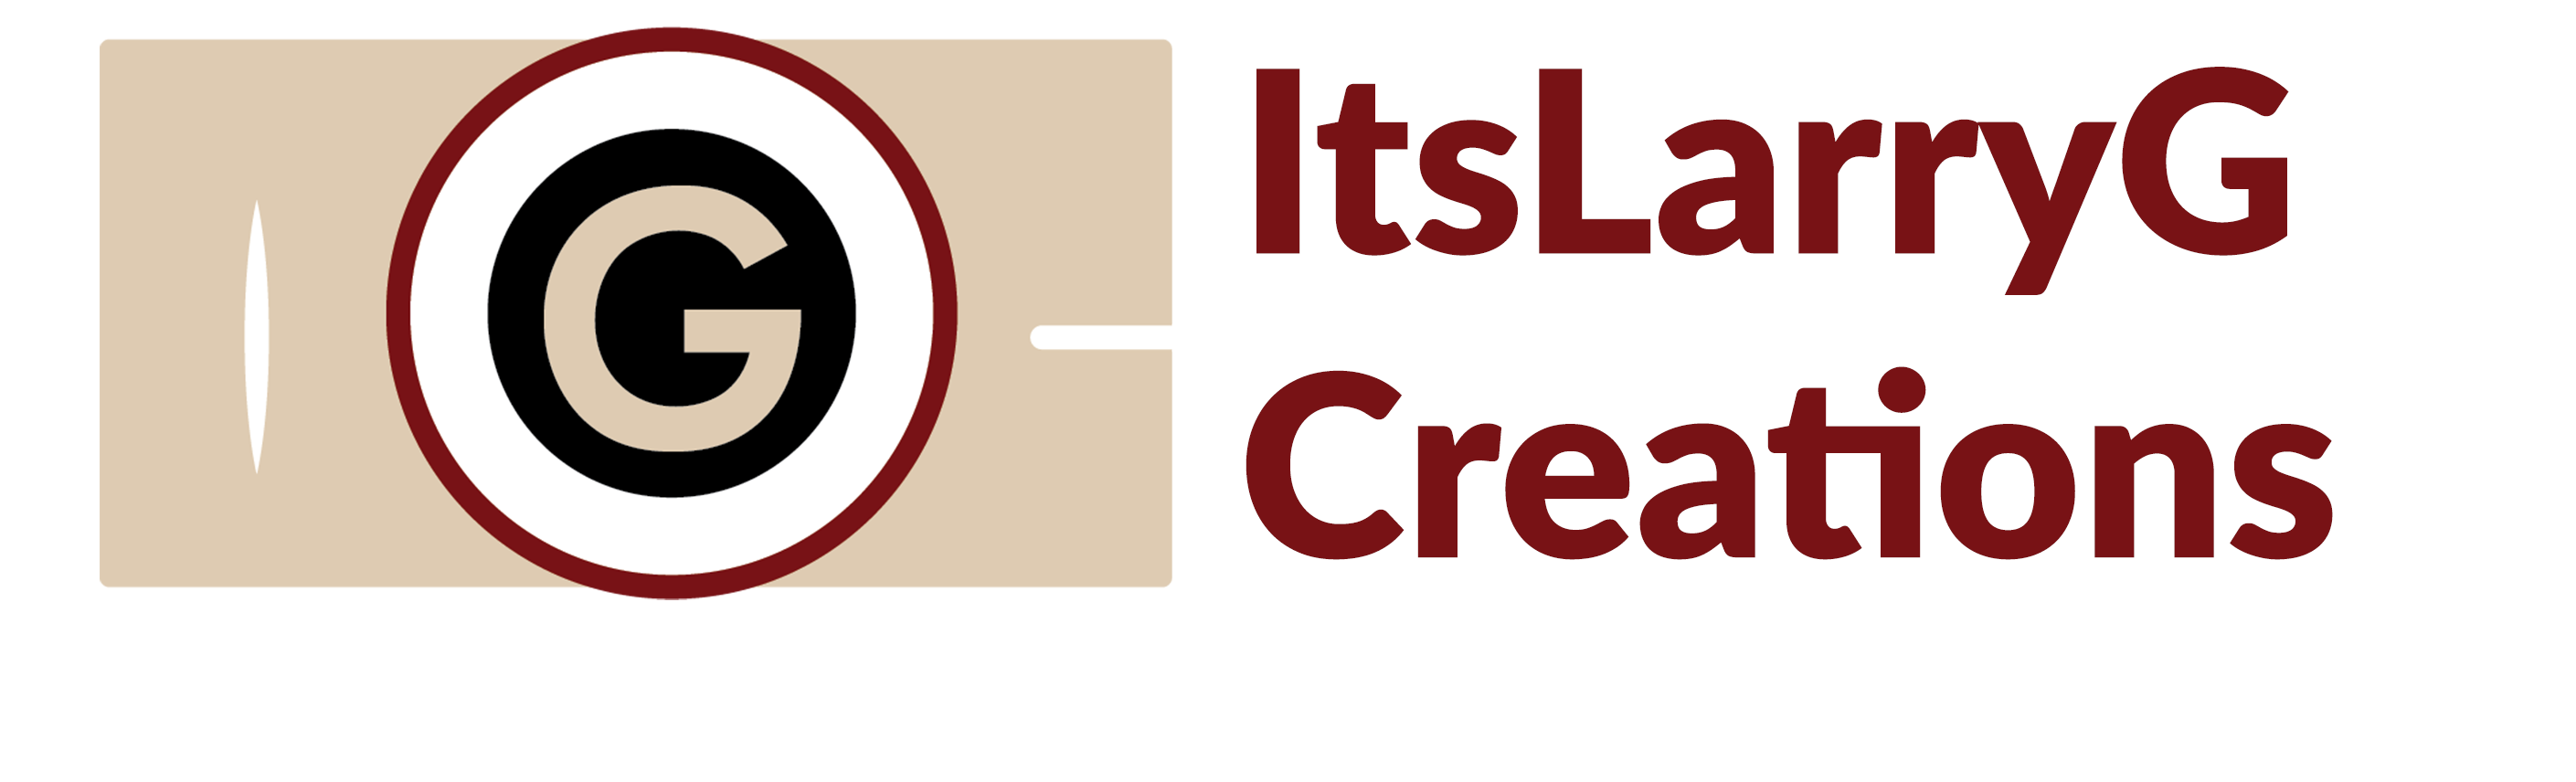 ItsLarryG Creations